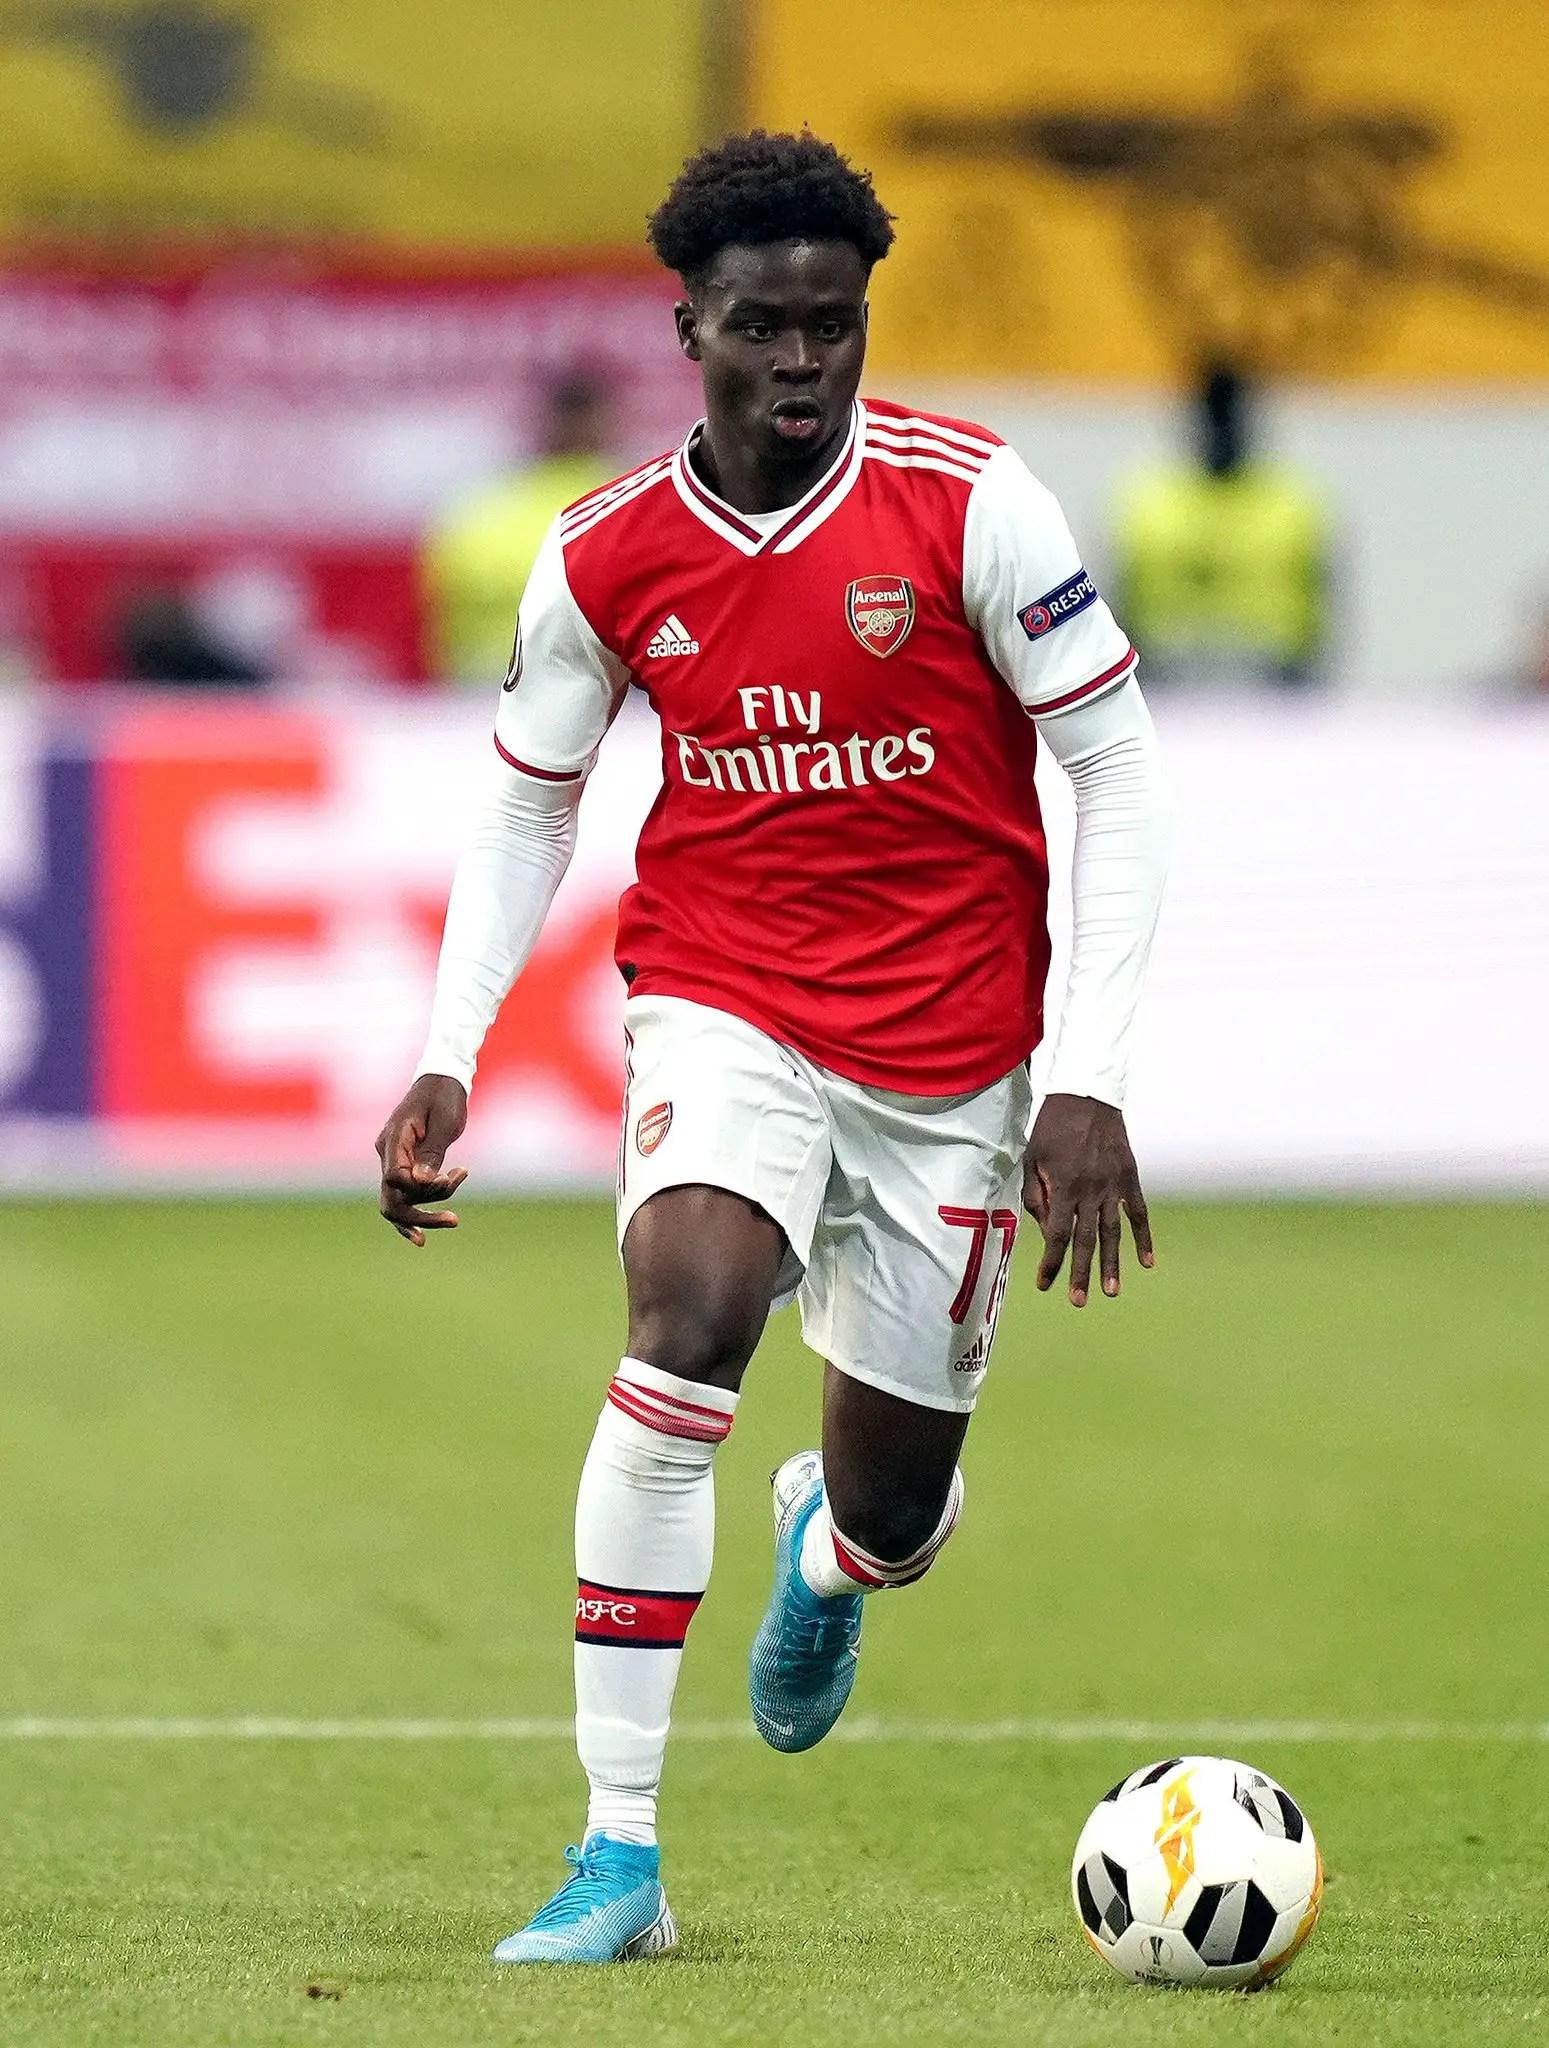 Saka Nominated For Arsenal's February Player Award